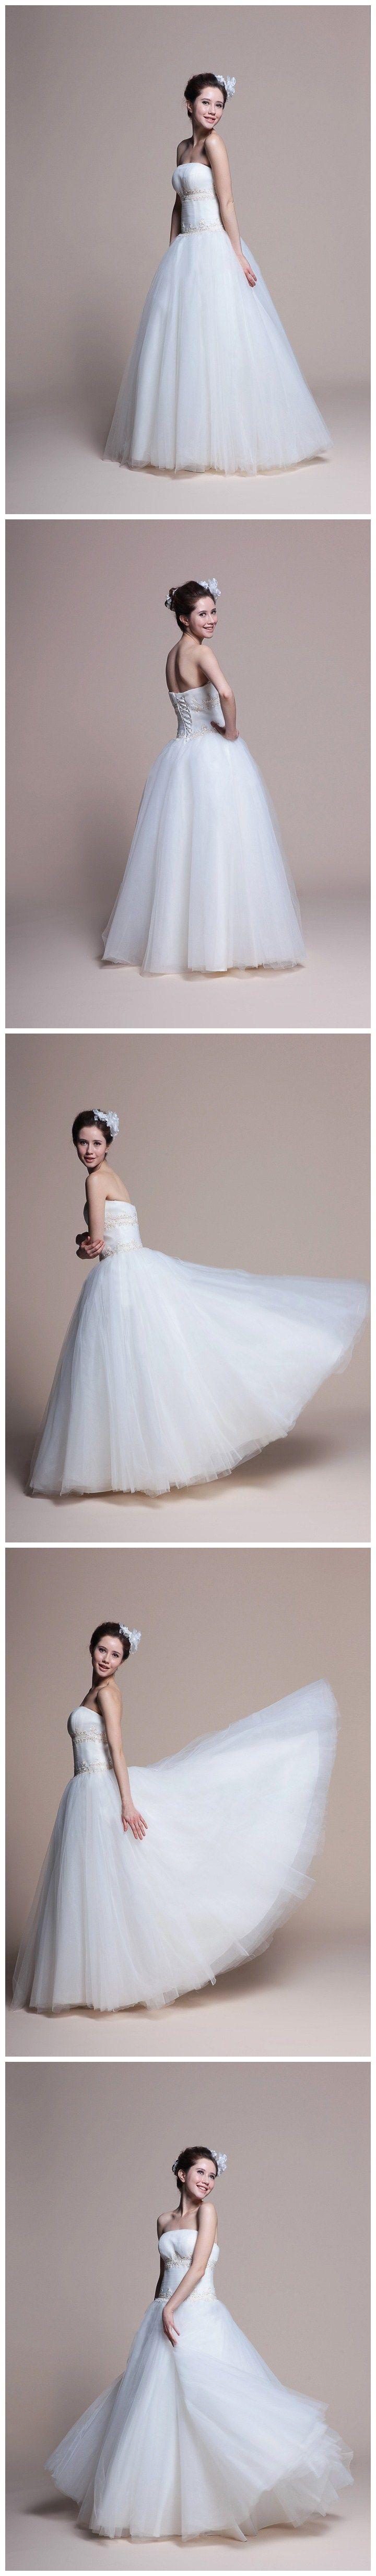 It is such a beautiful dress...